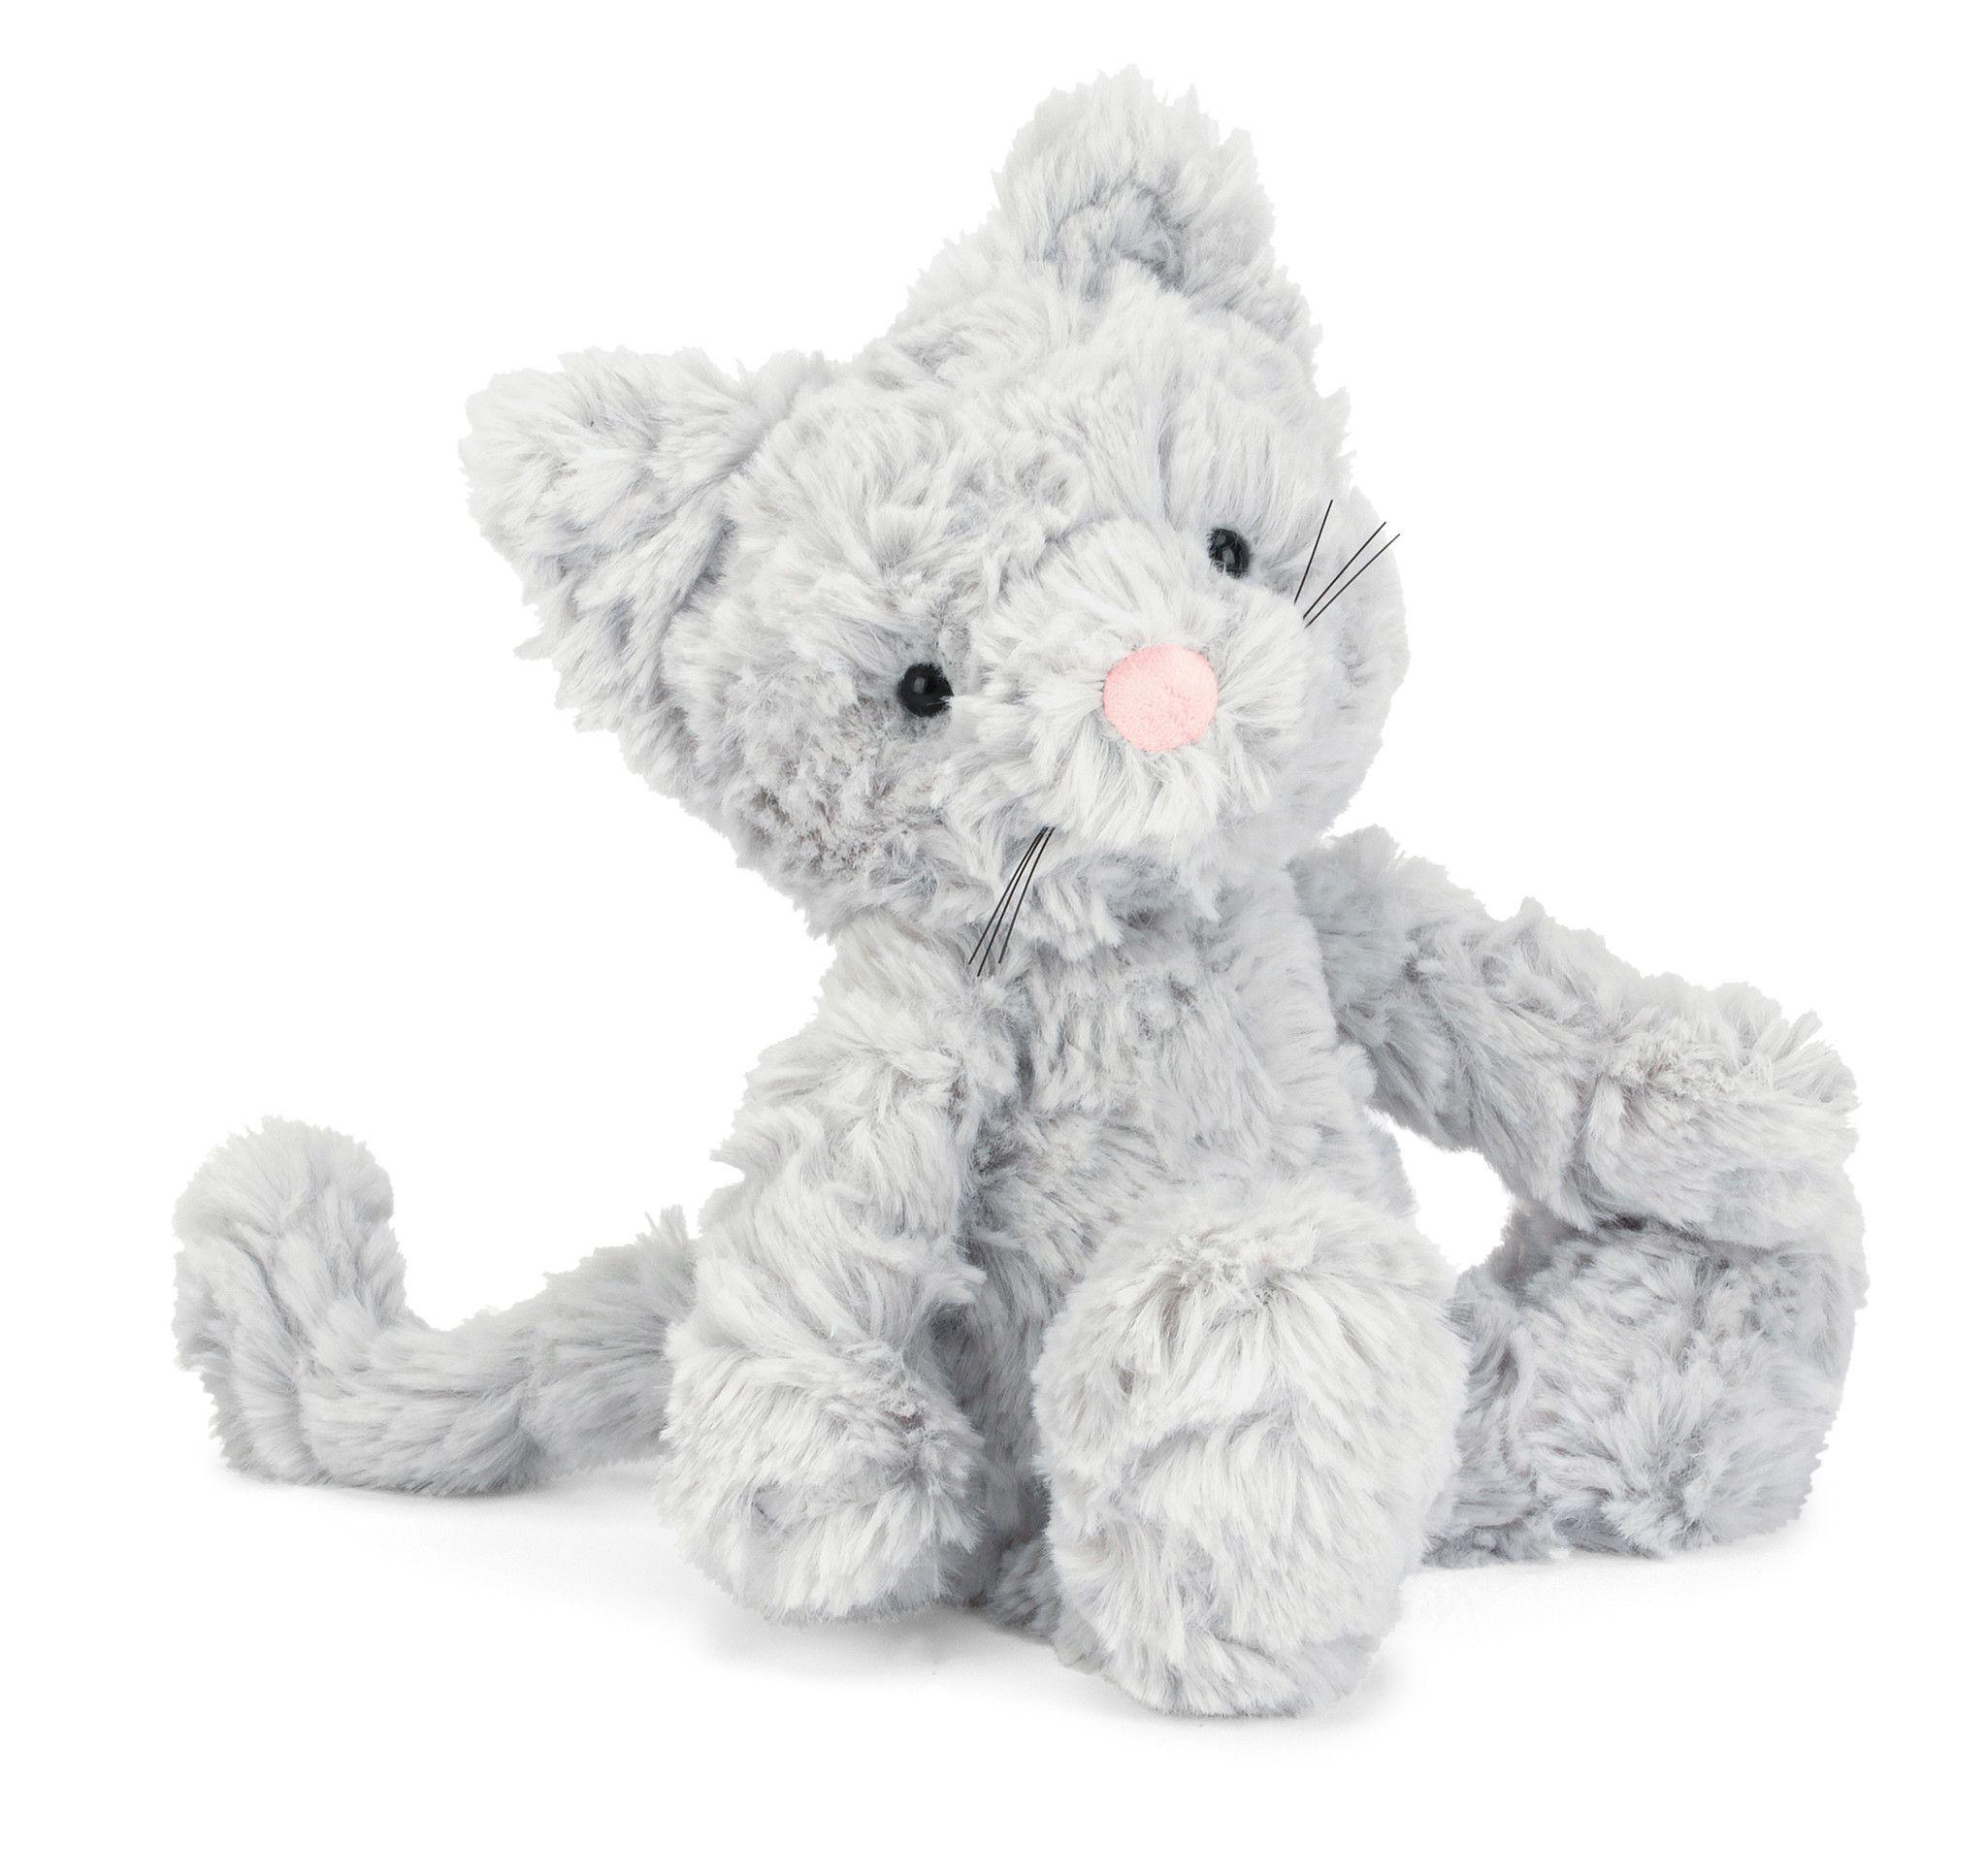 Jellycat Squiggle Kitty 9 Jellycat Stuffed Animals Teddy Bear Stuffed Animal Stuffed Animal Cat